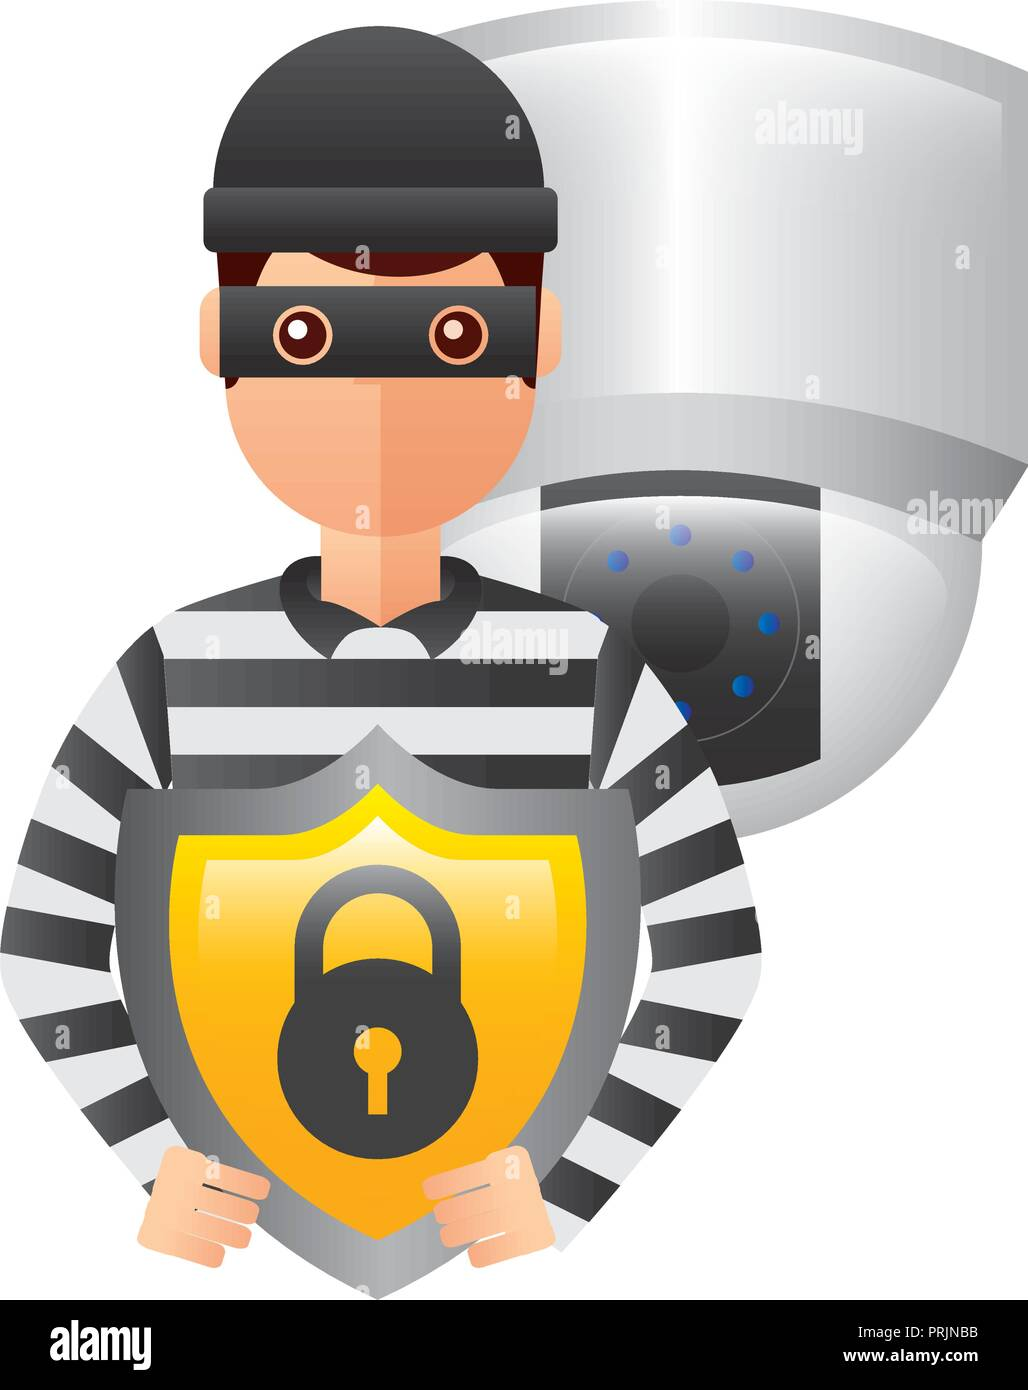 Illustration Cartoon Cctv Security Camera Stock Photos